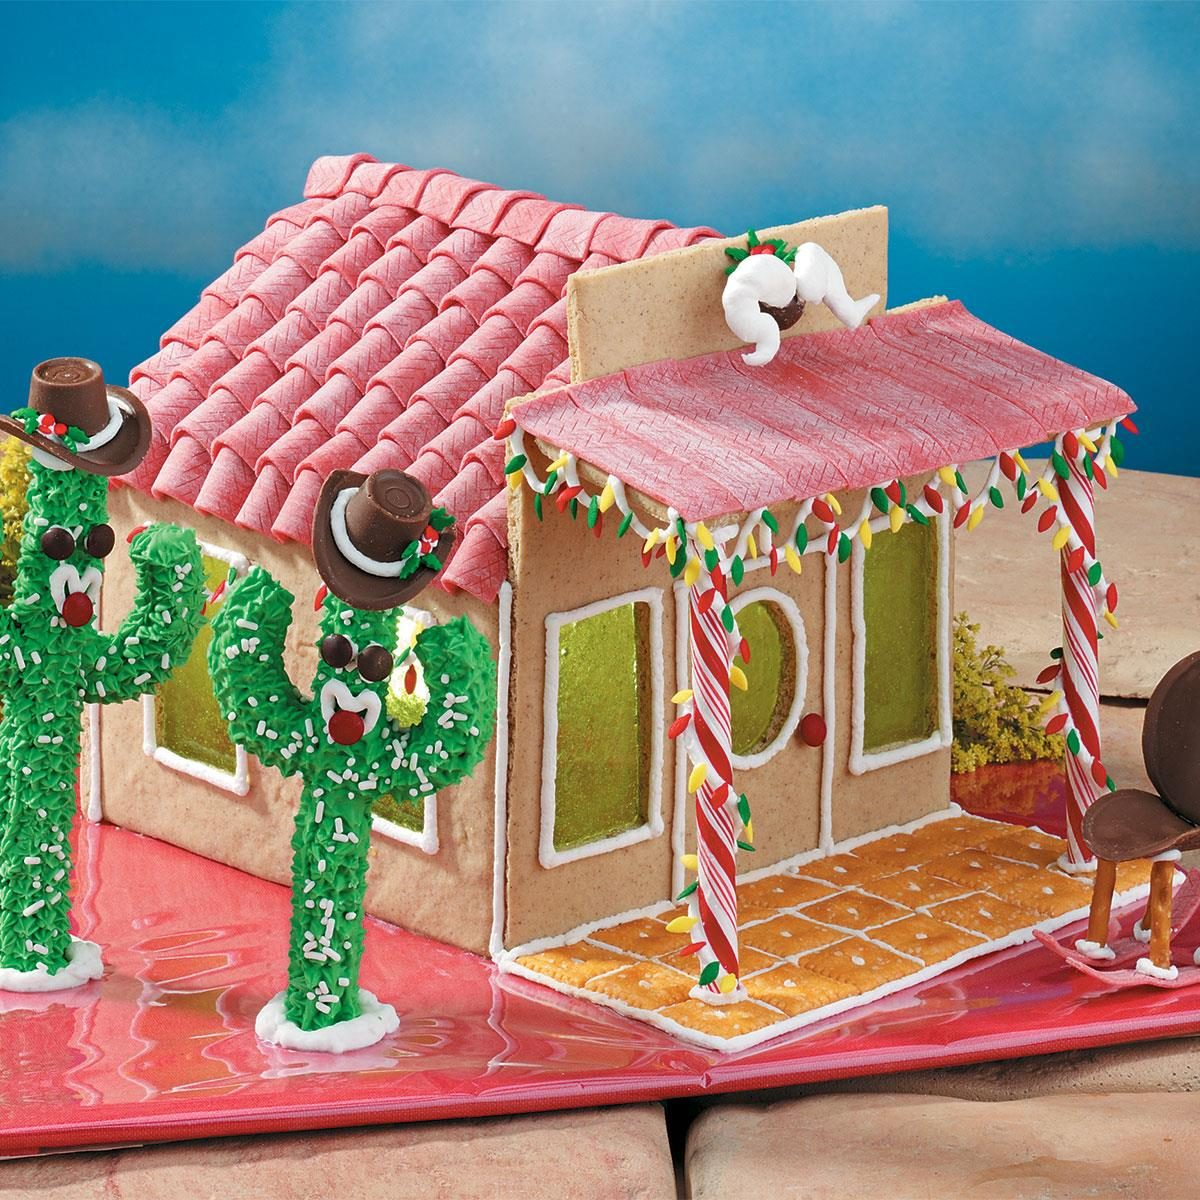 Fullsize Of Gingerbread House Ideas